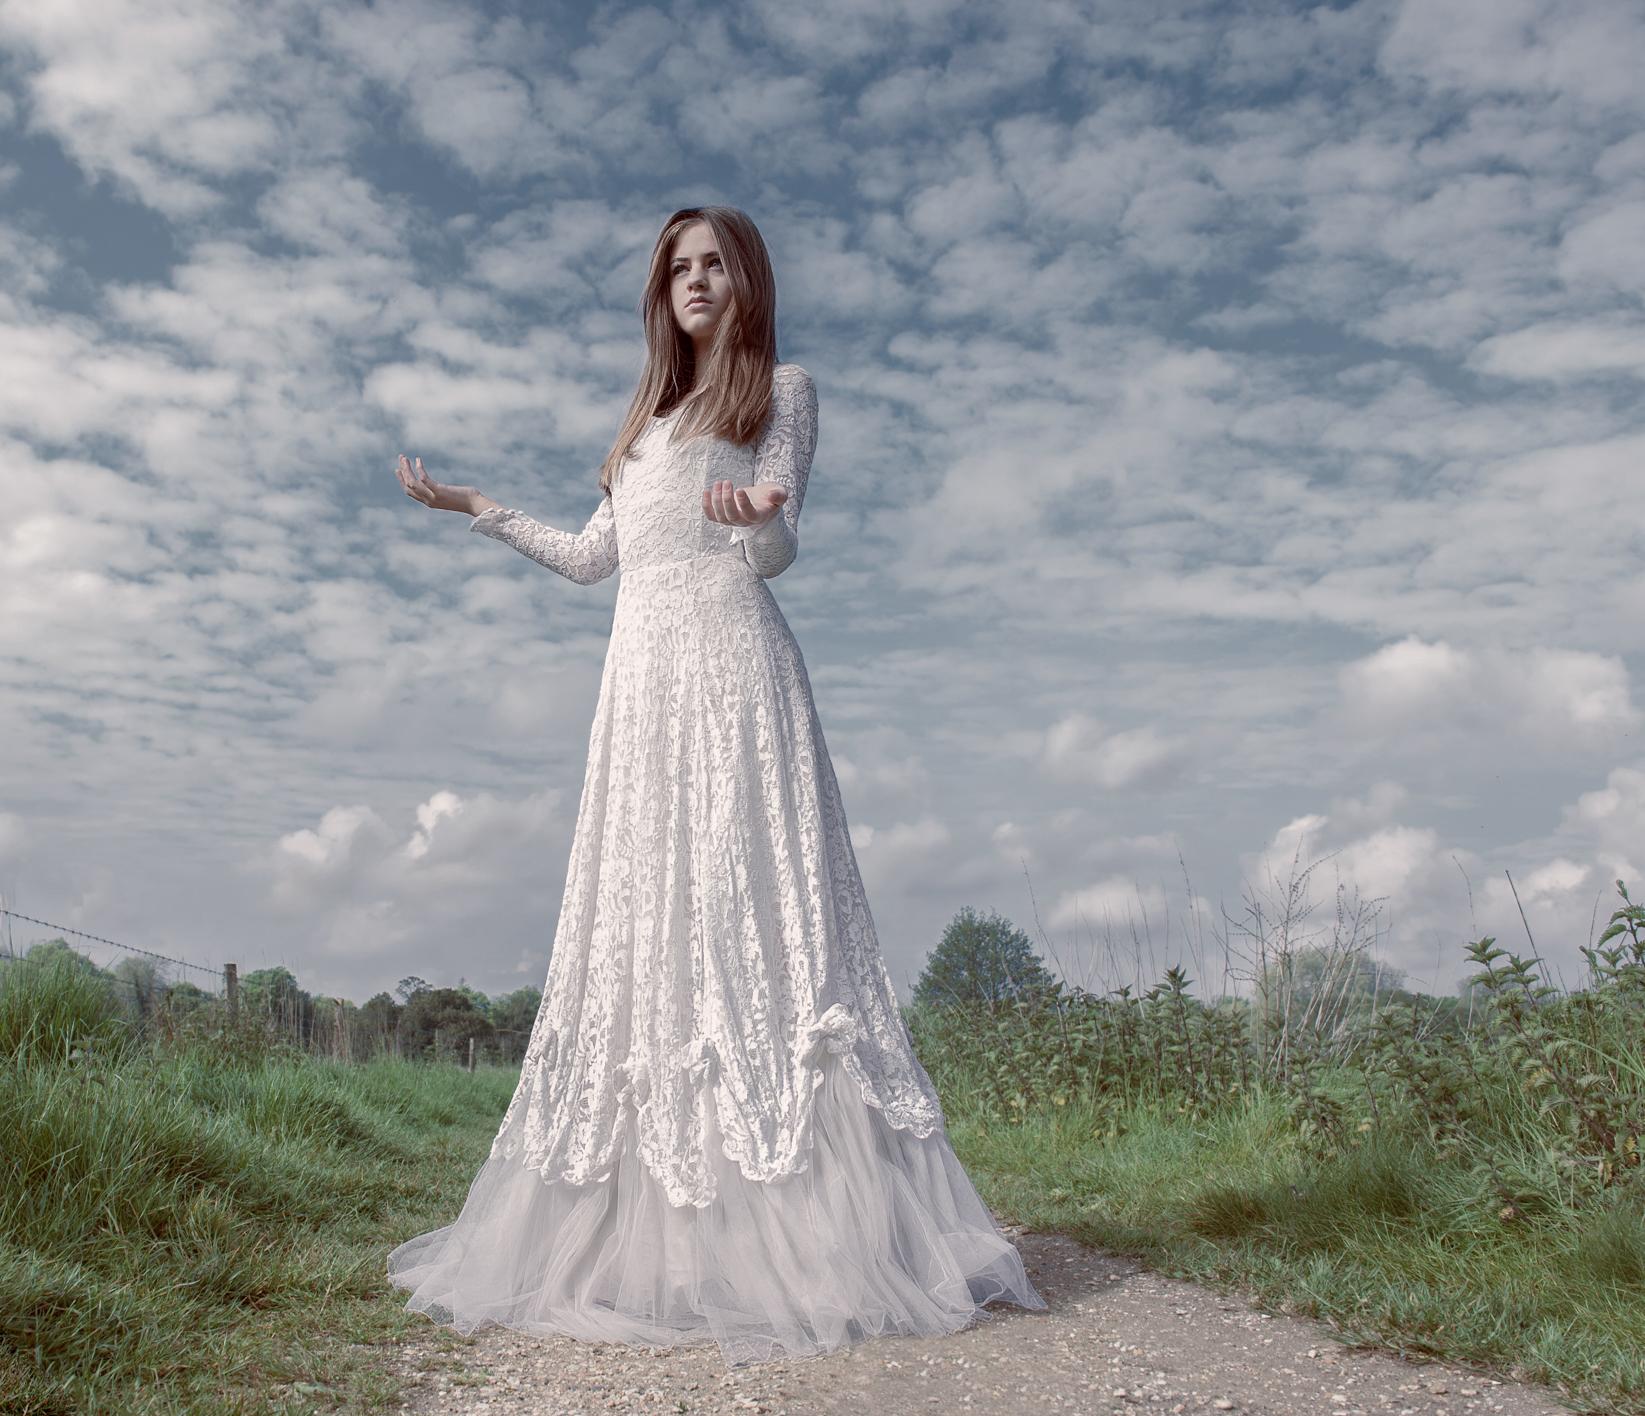 Wedding portrait by Farnham, Surrey based wedding photographer James Muller